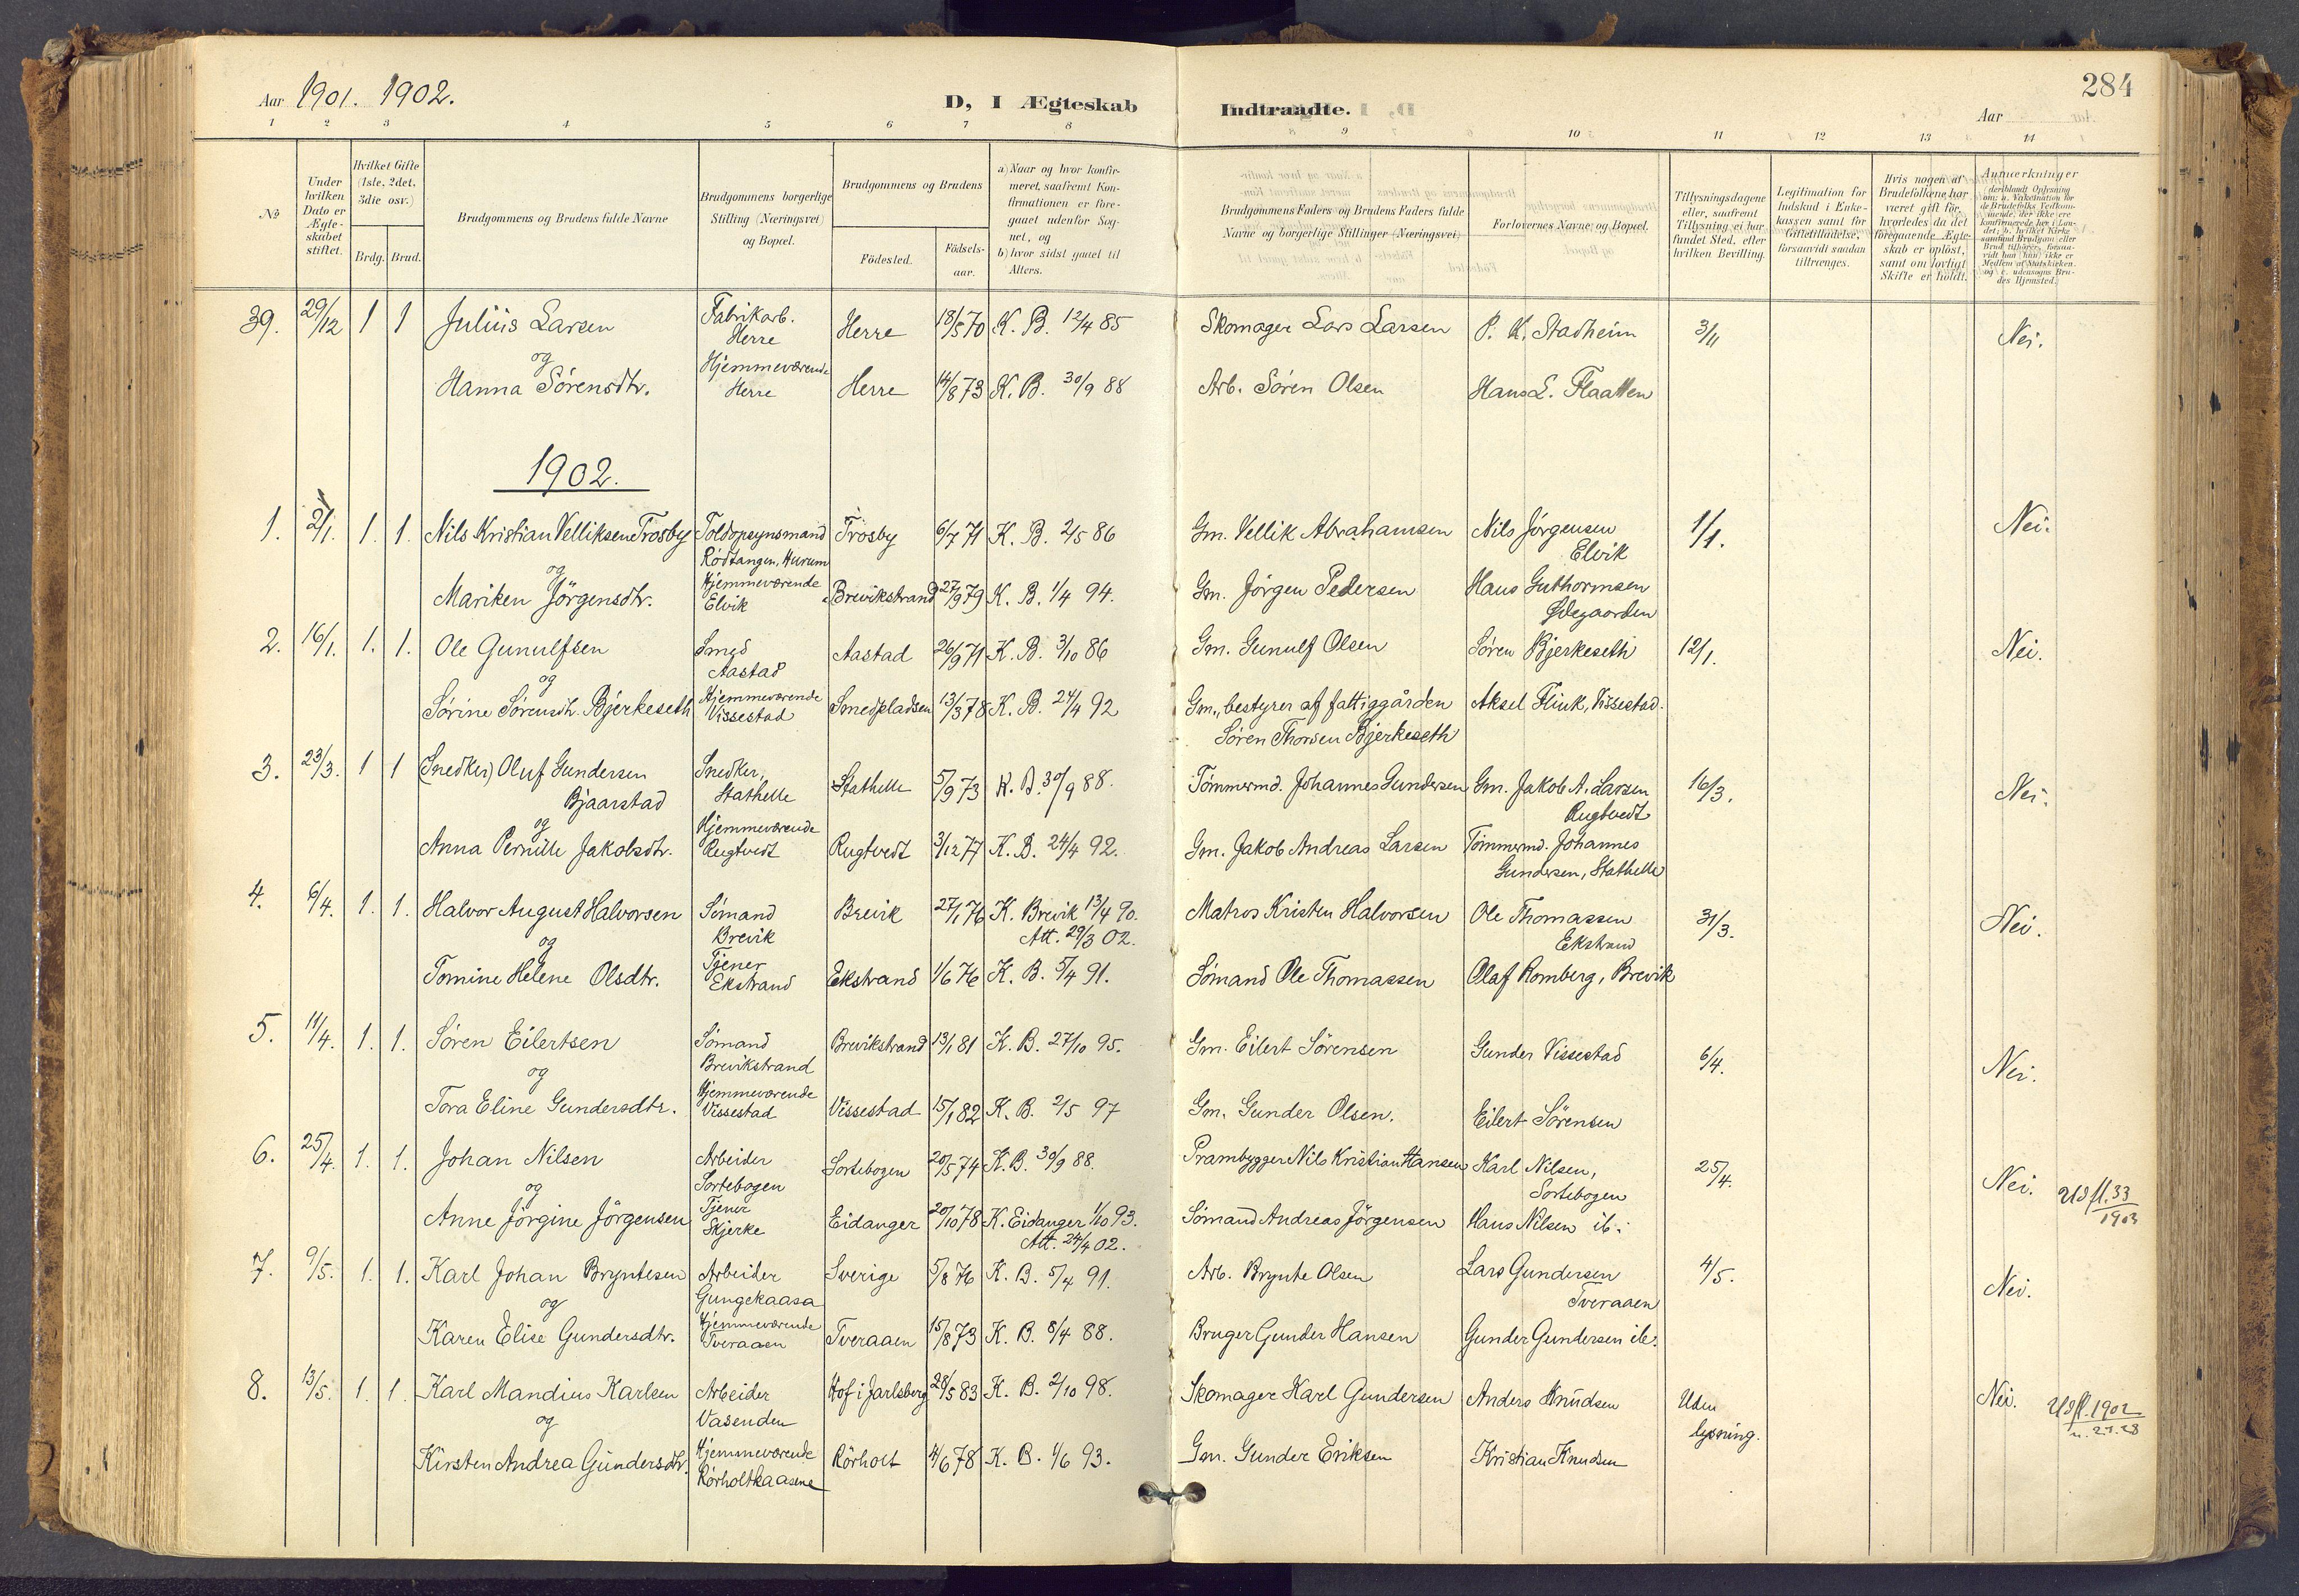 SAKO, Bamble kirkebøker, F/Fa/L0009: Ministerialbok nr. I 9, 1901-1917, s. 284